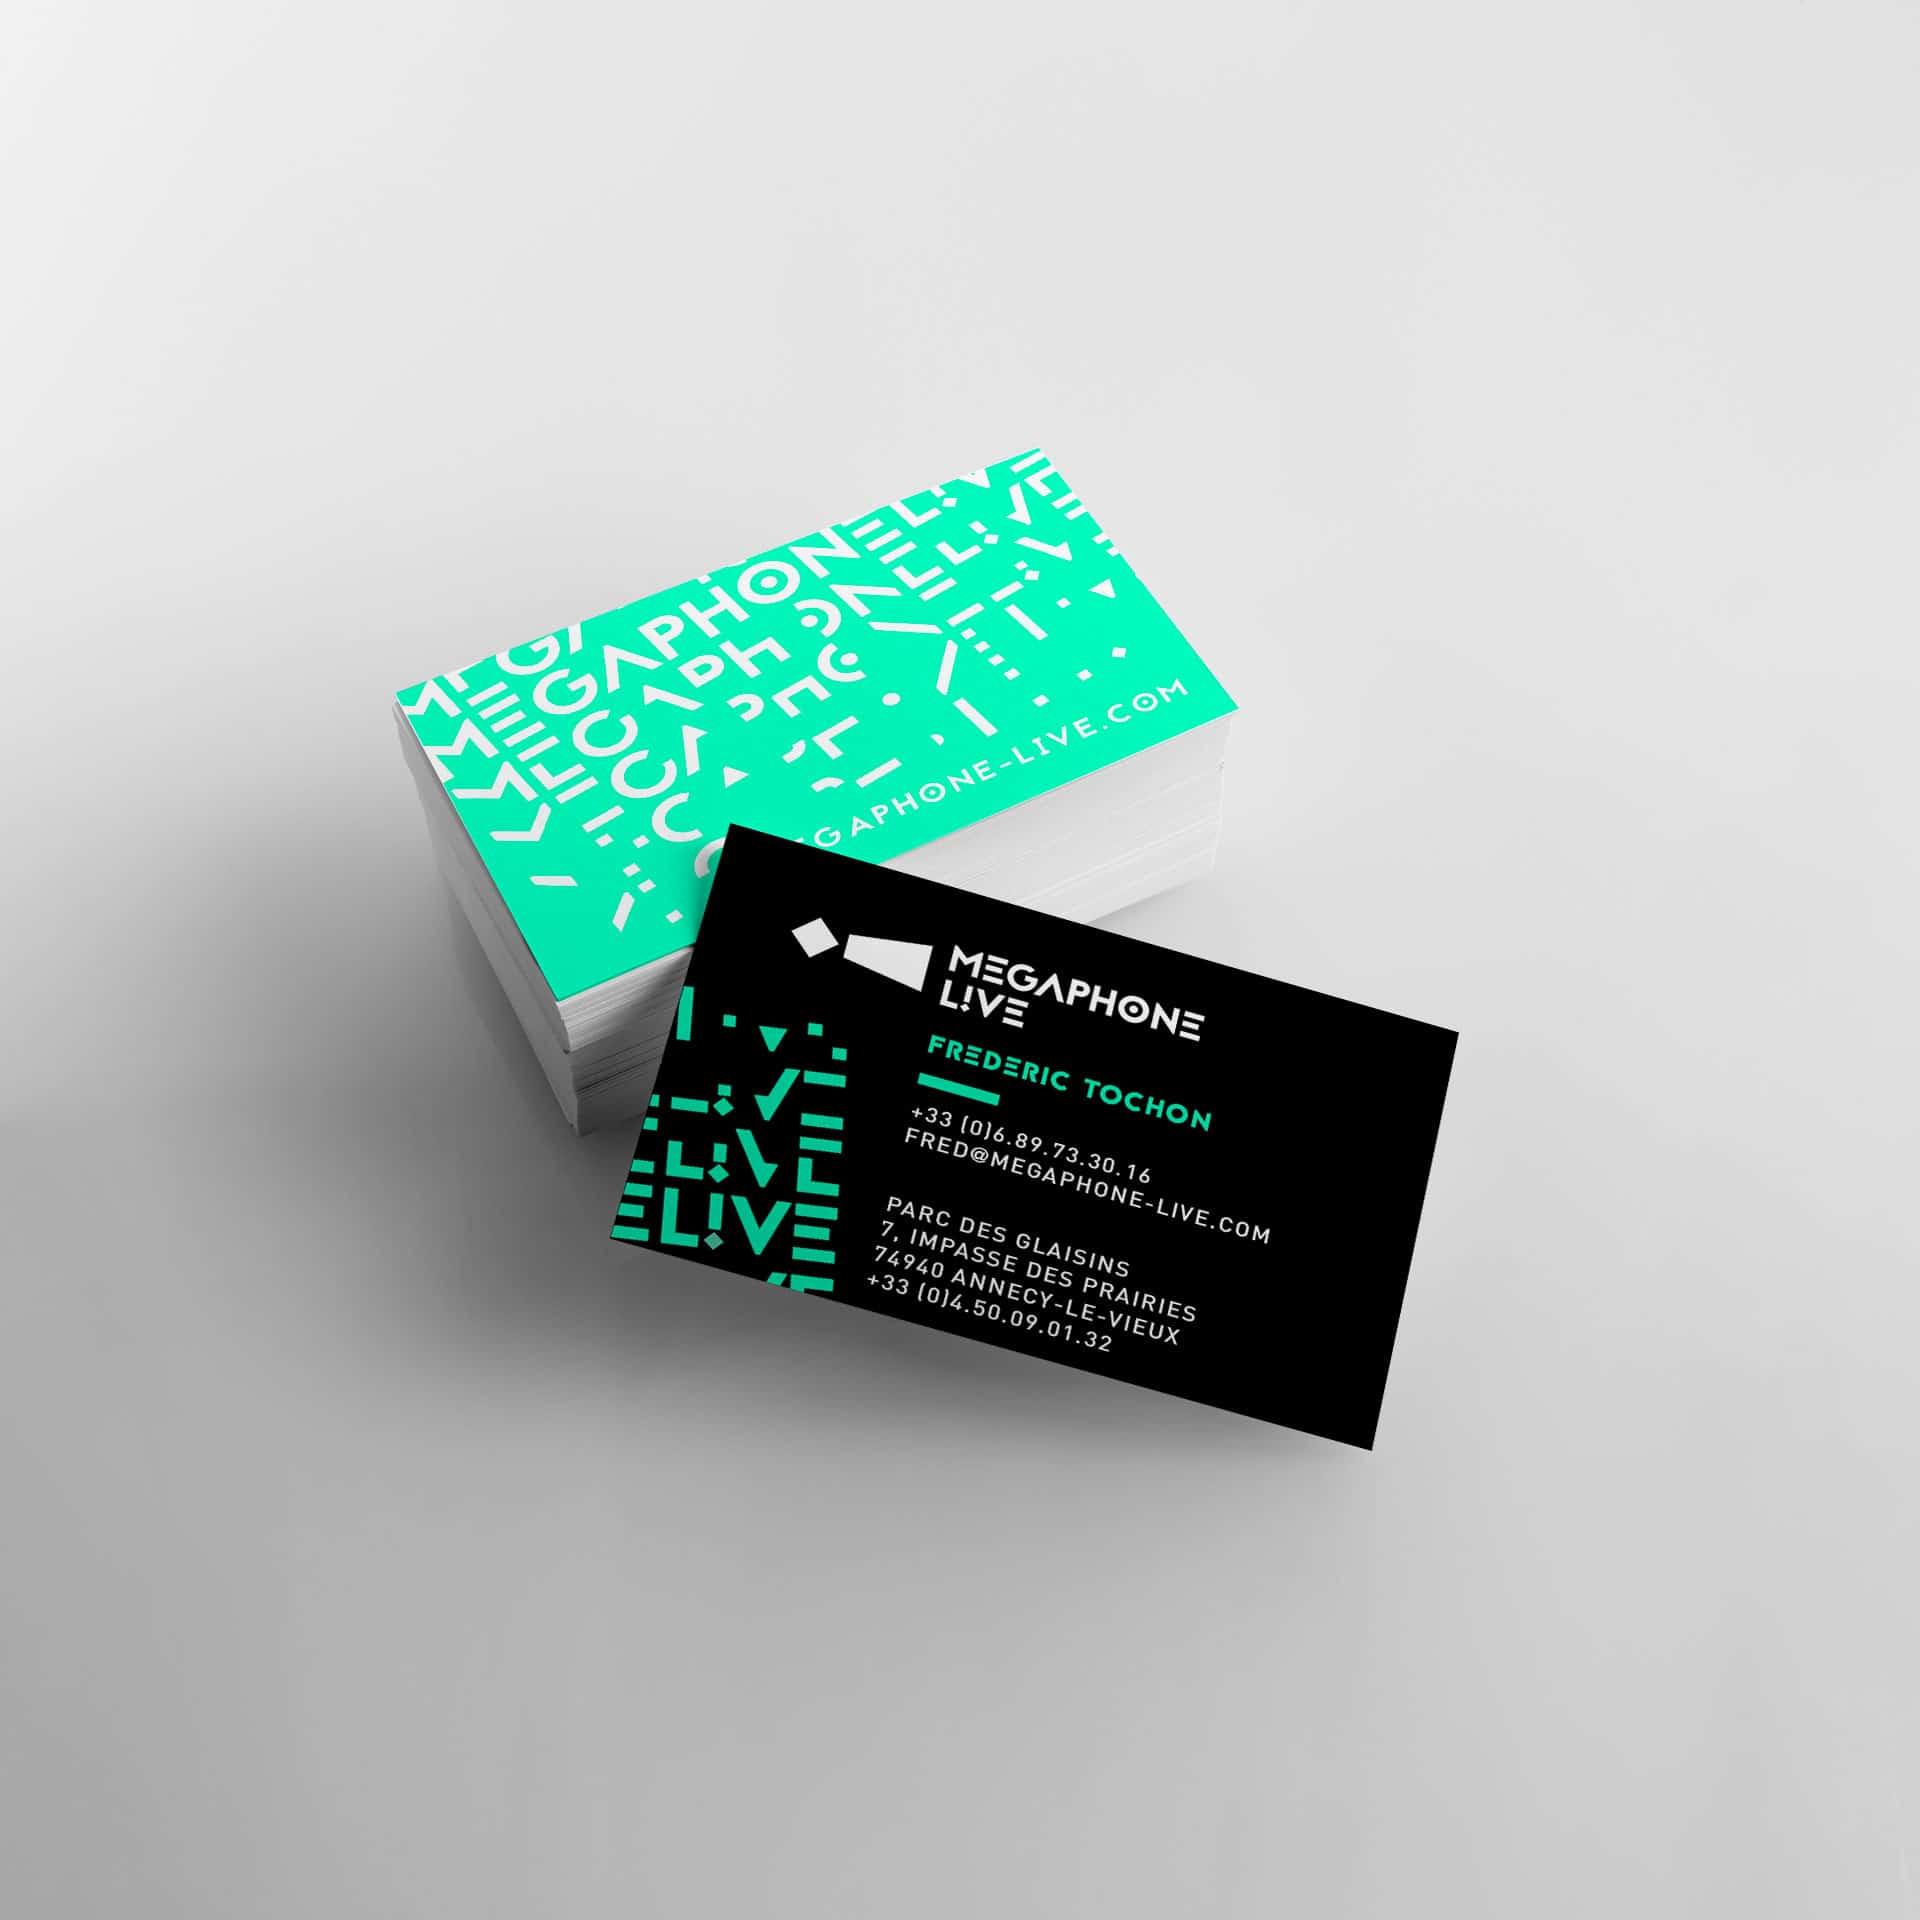 Megaphone Live, création logotype